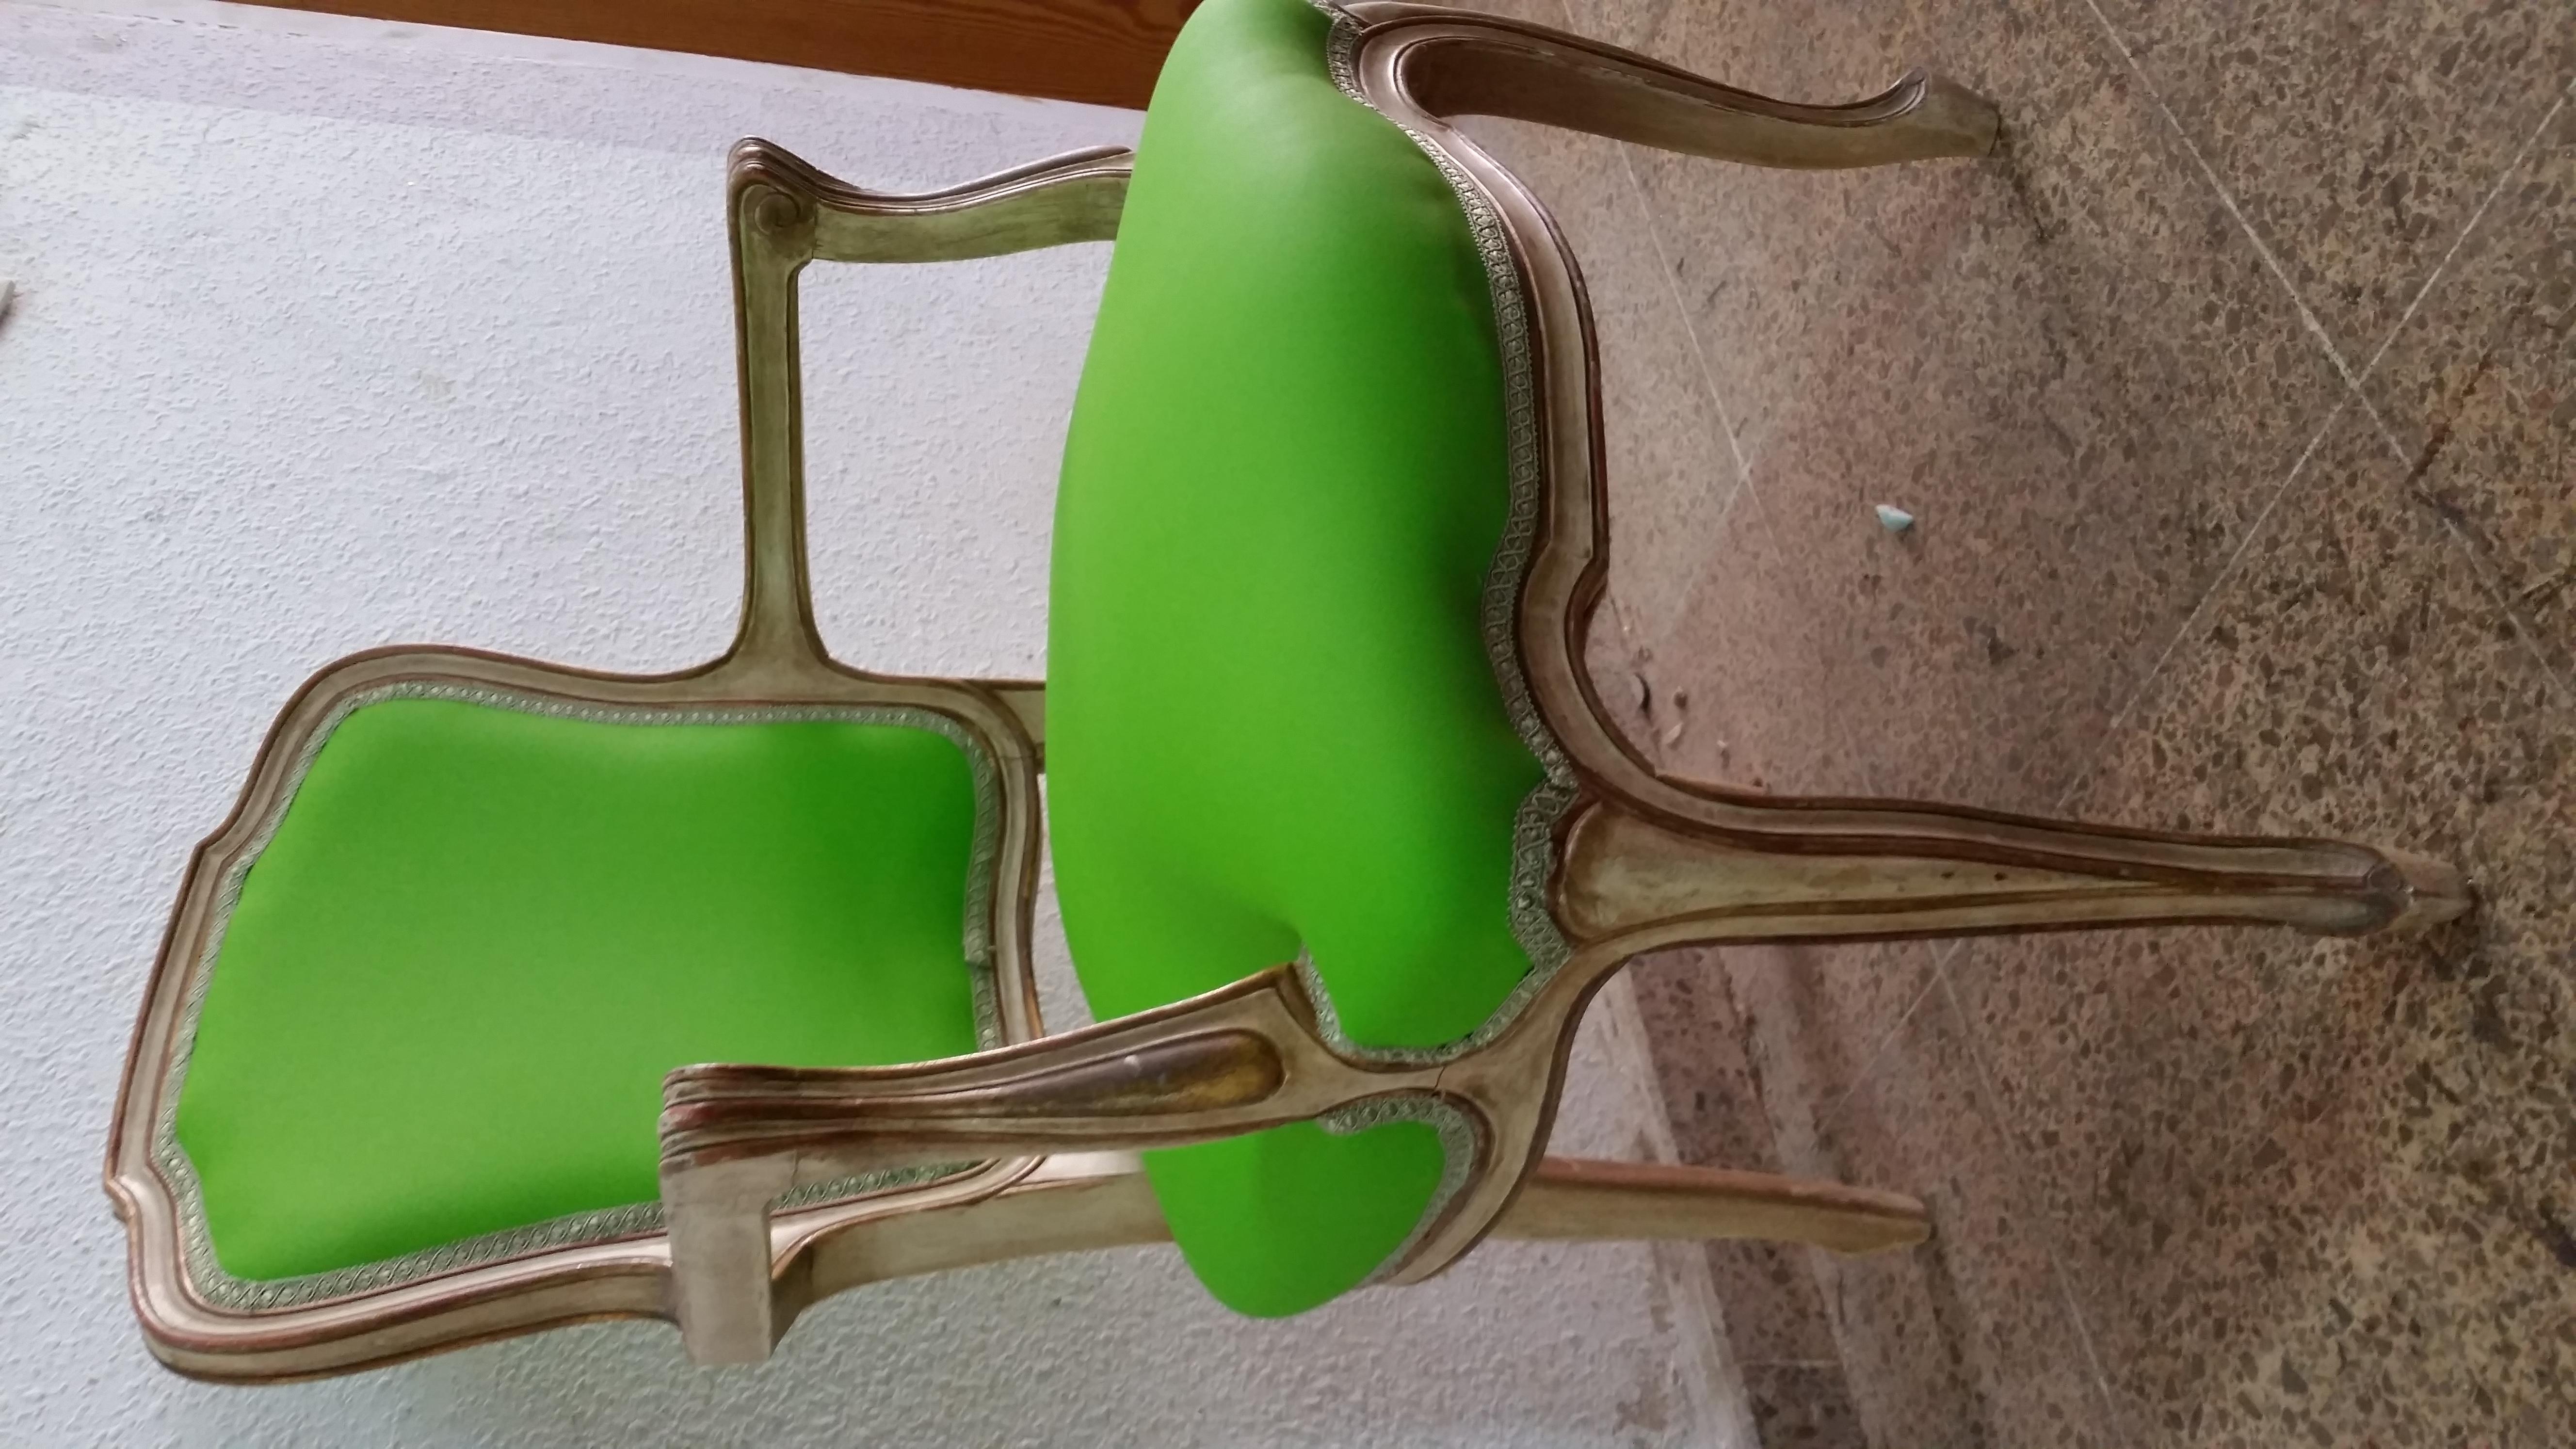 Vida a tus sillas